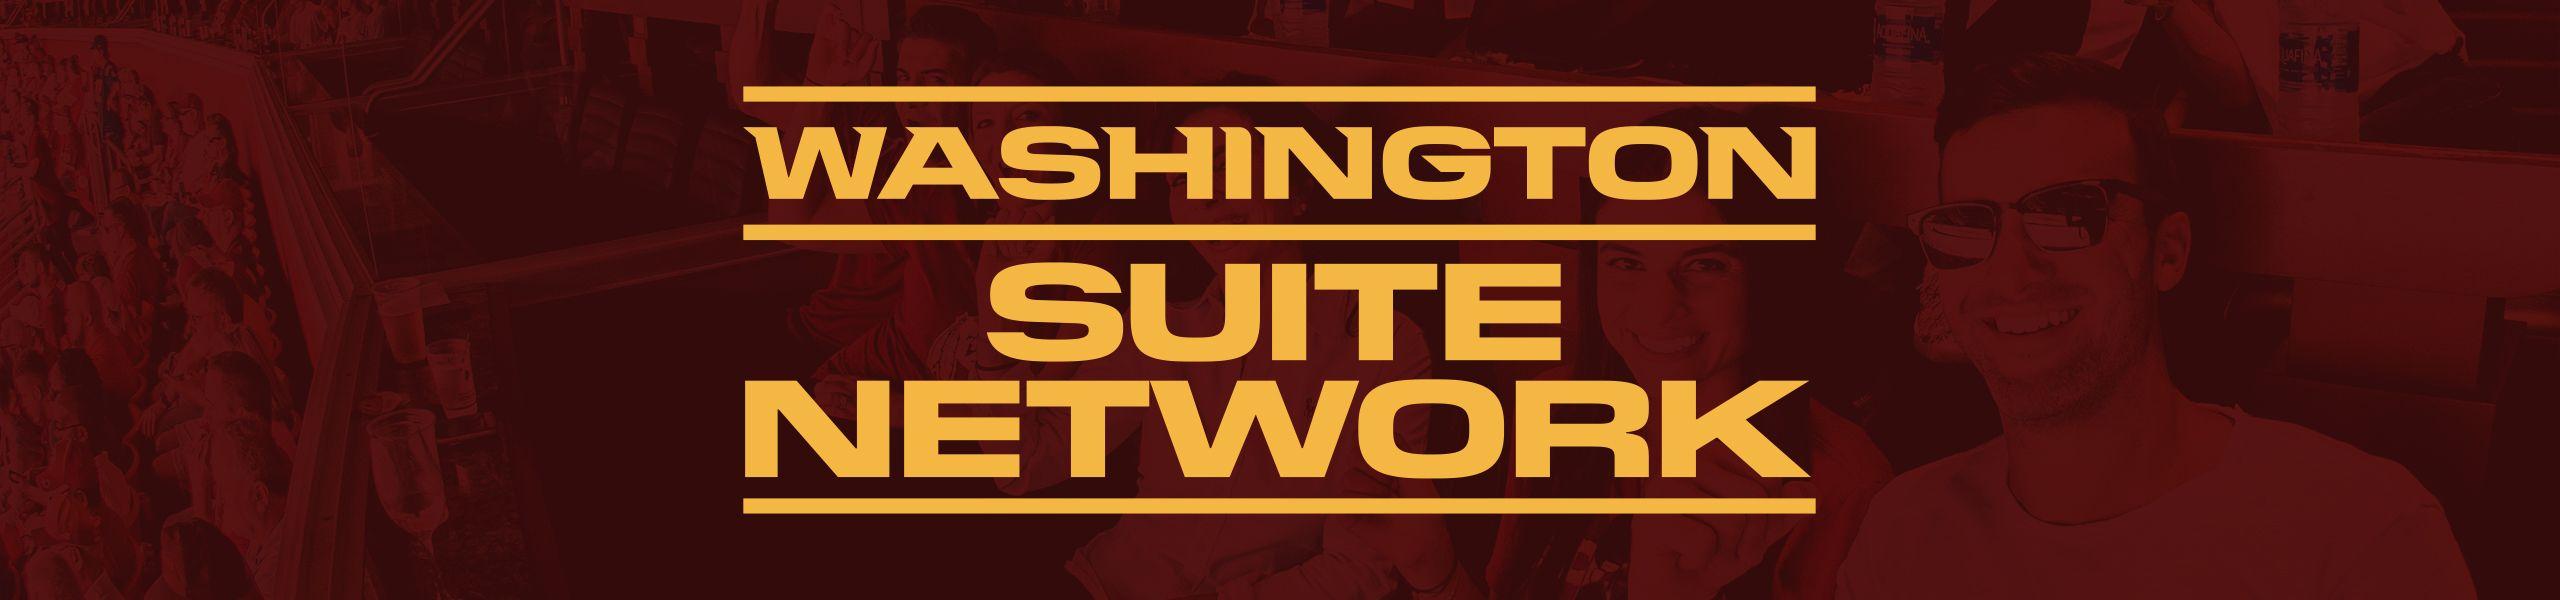 Website_WashingtonSuiteNetwork_Header_2560x600